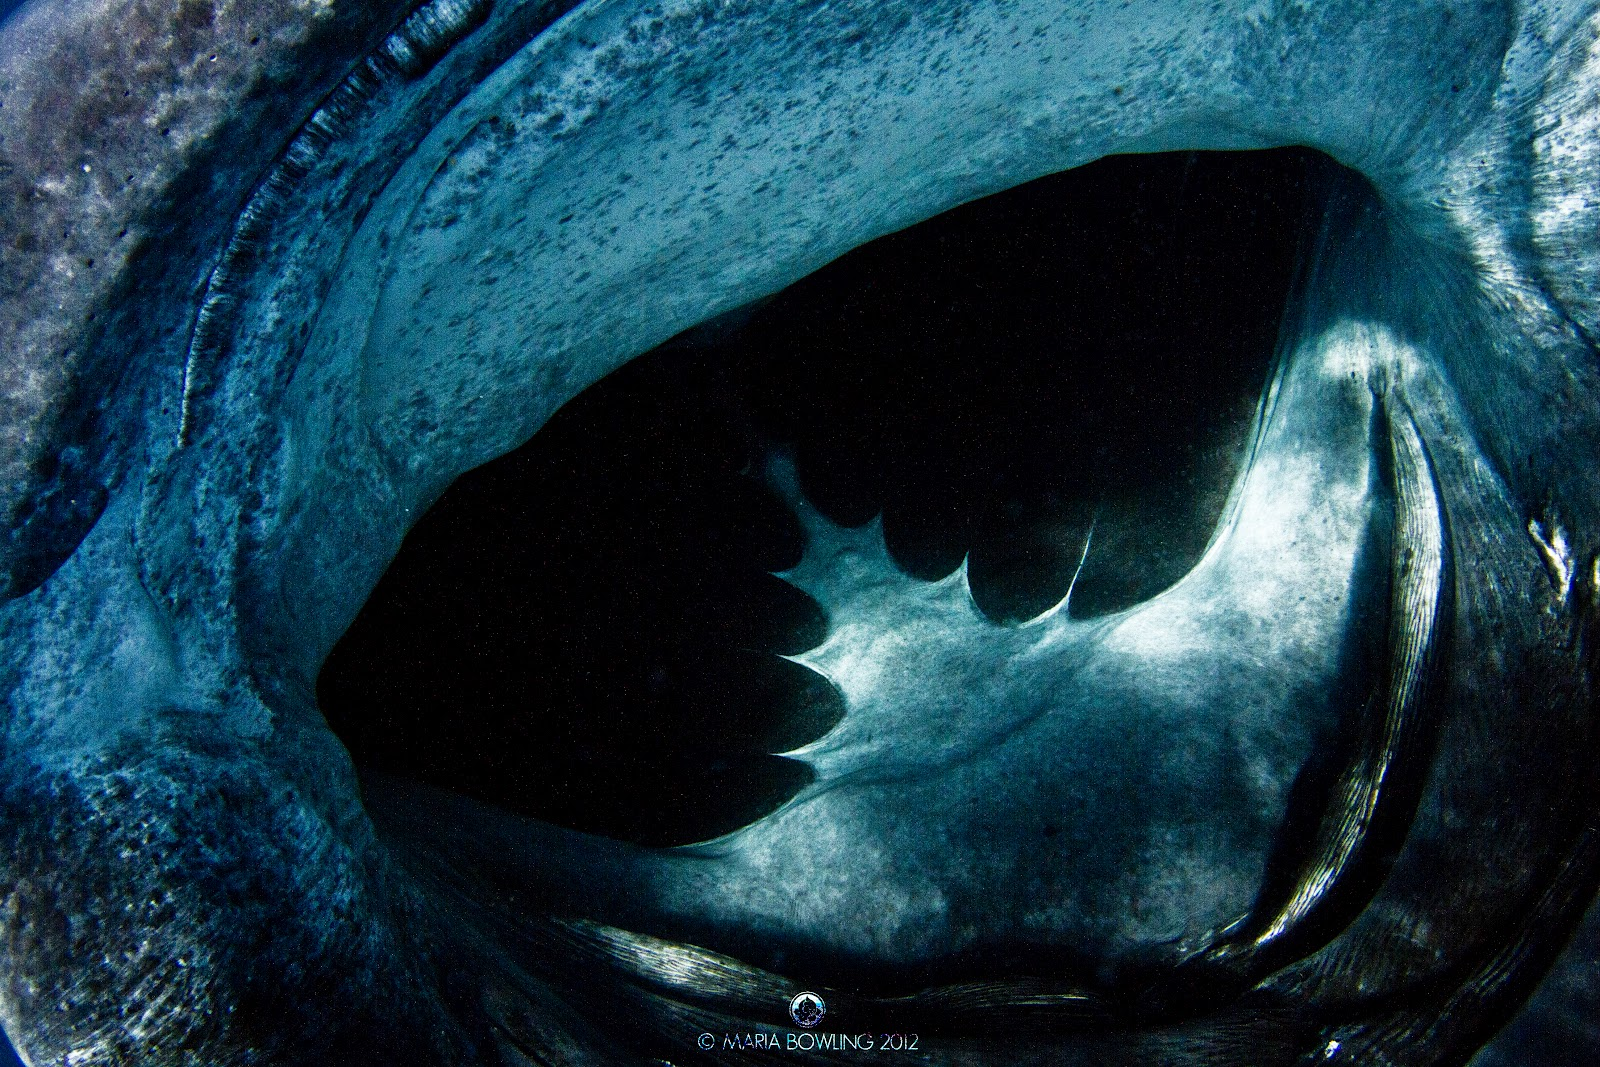 Aninimal Book: Pretty Medicine : The Elusive Whale Shark (Rhinocodon typus)